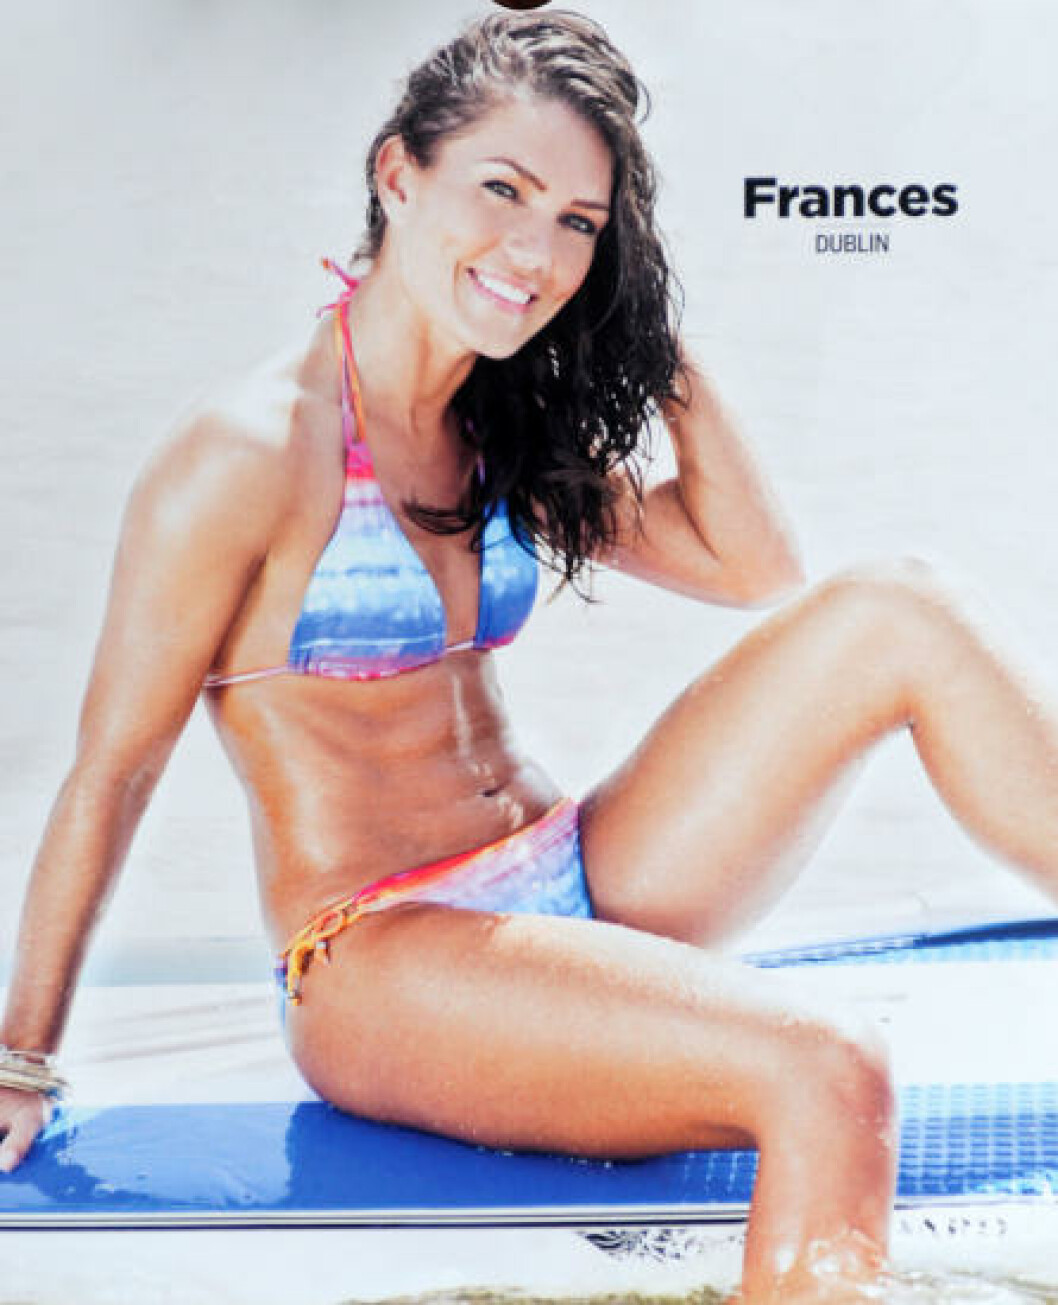 <strong>JUNI:</strong> Frances fra Dublin i Irland. Foto: Stella Pictures